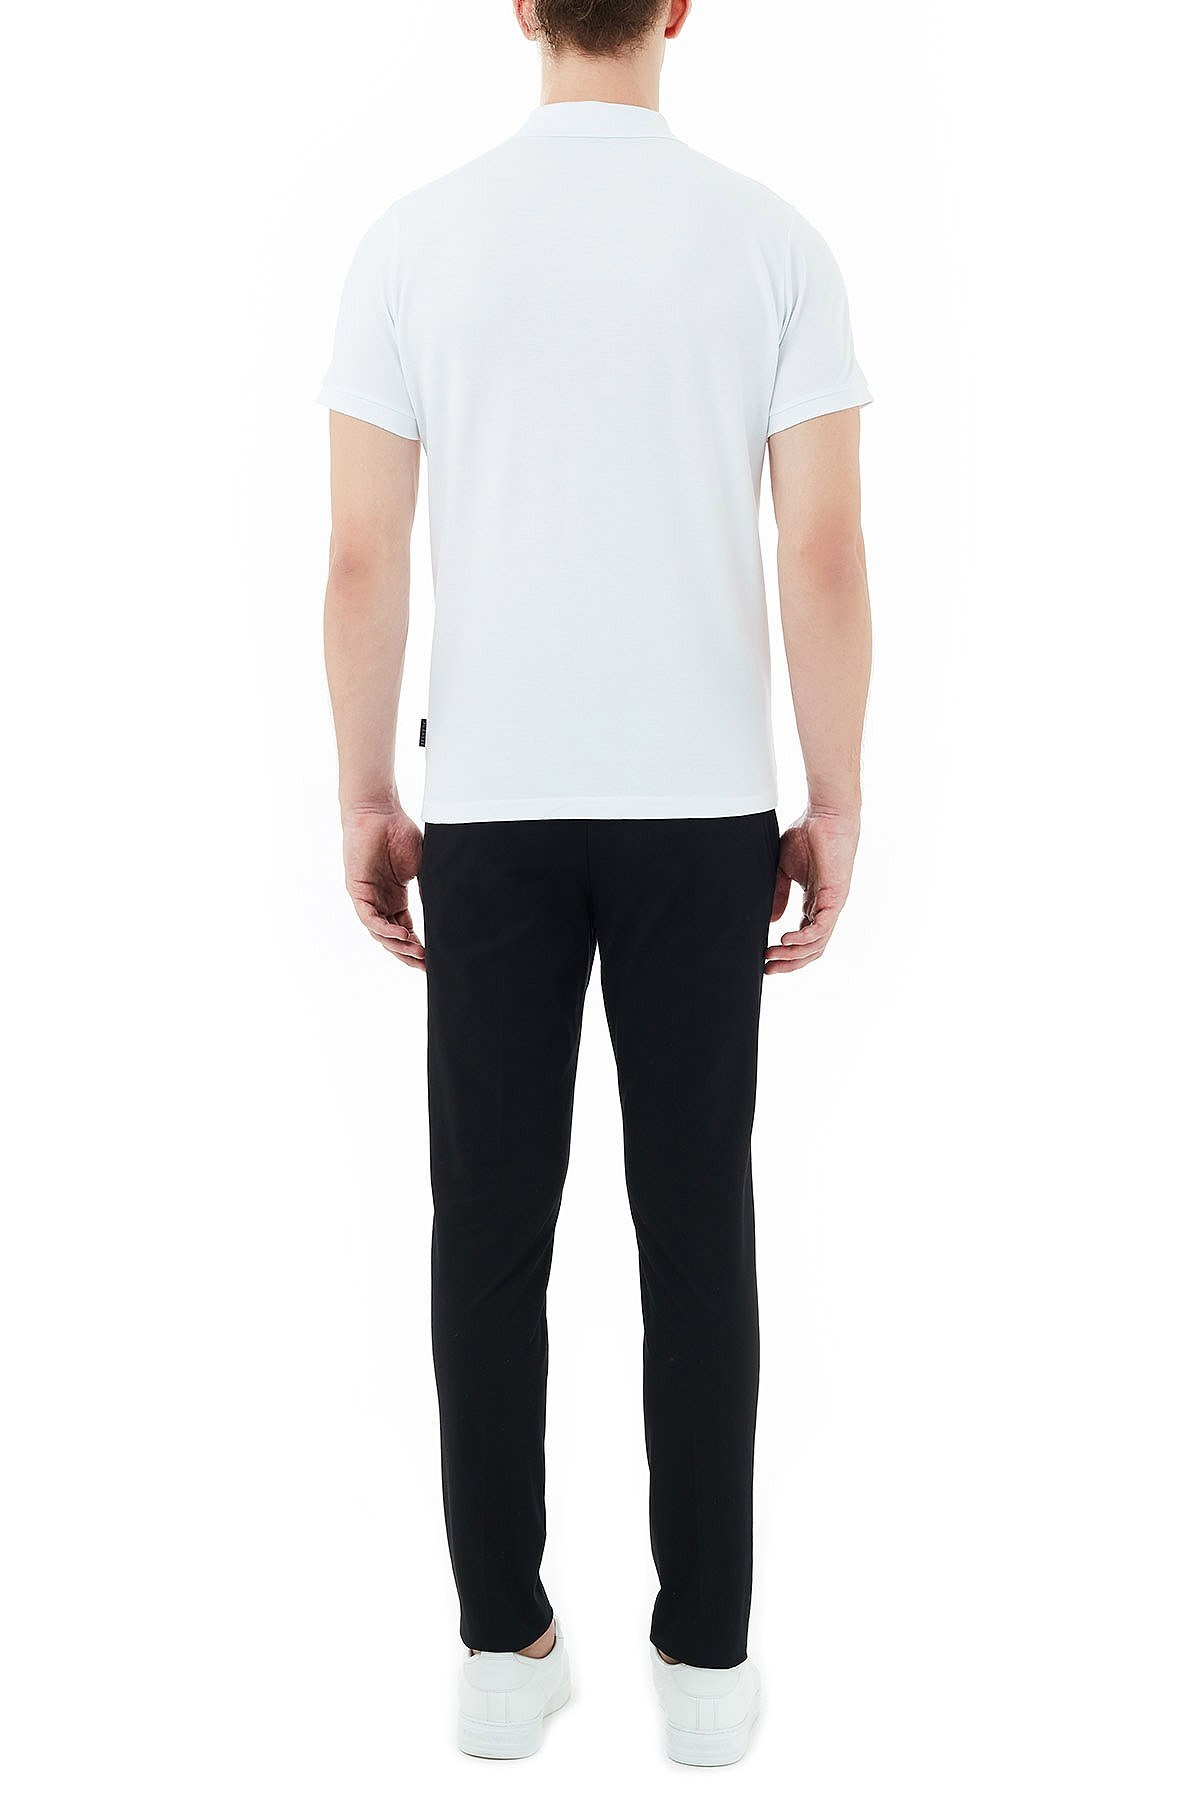 Hugo Boss Slim Fit Cepli Erkek Pantolon 50437895 001 SİYAH